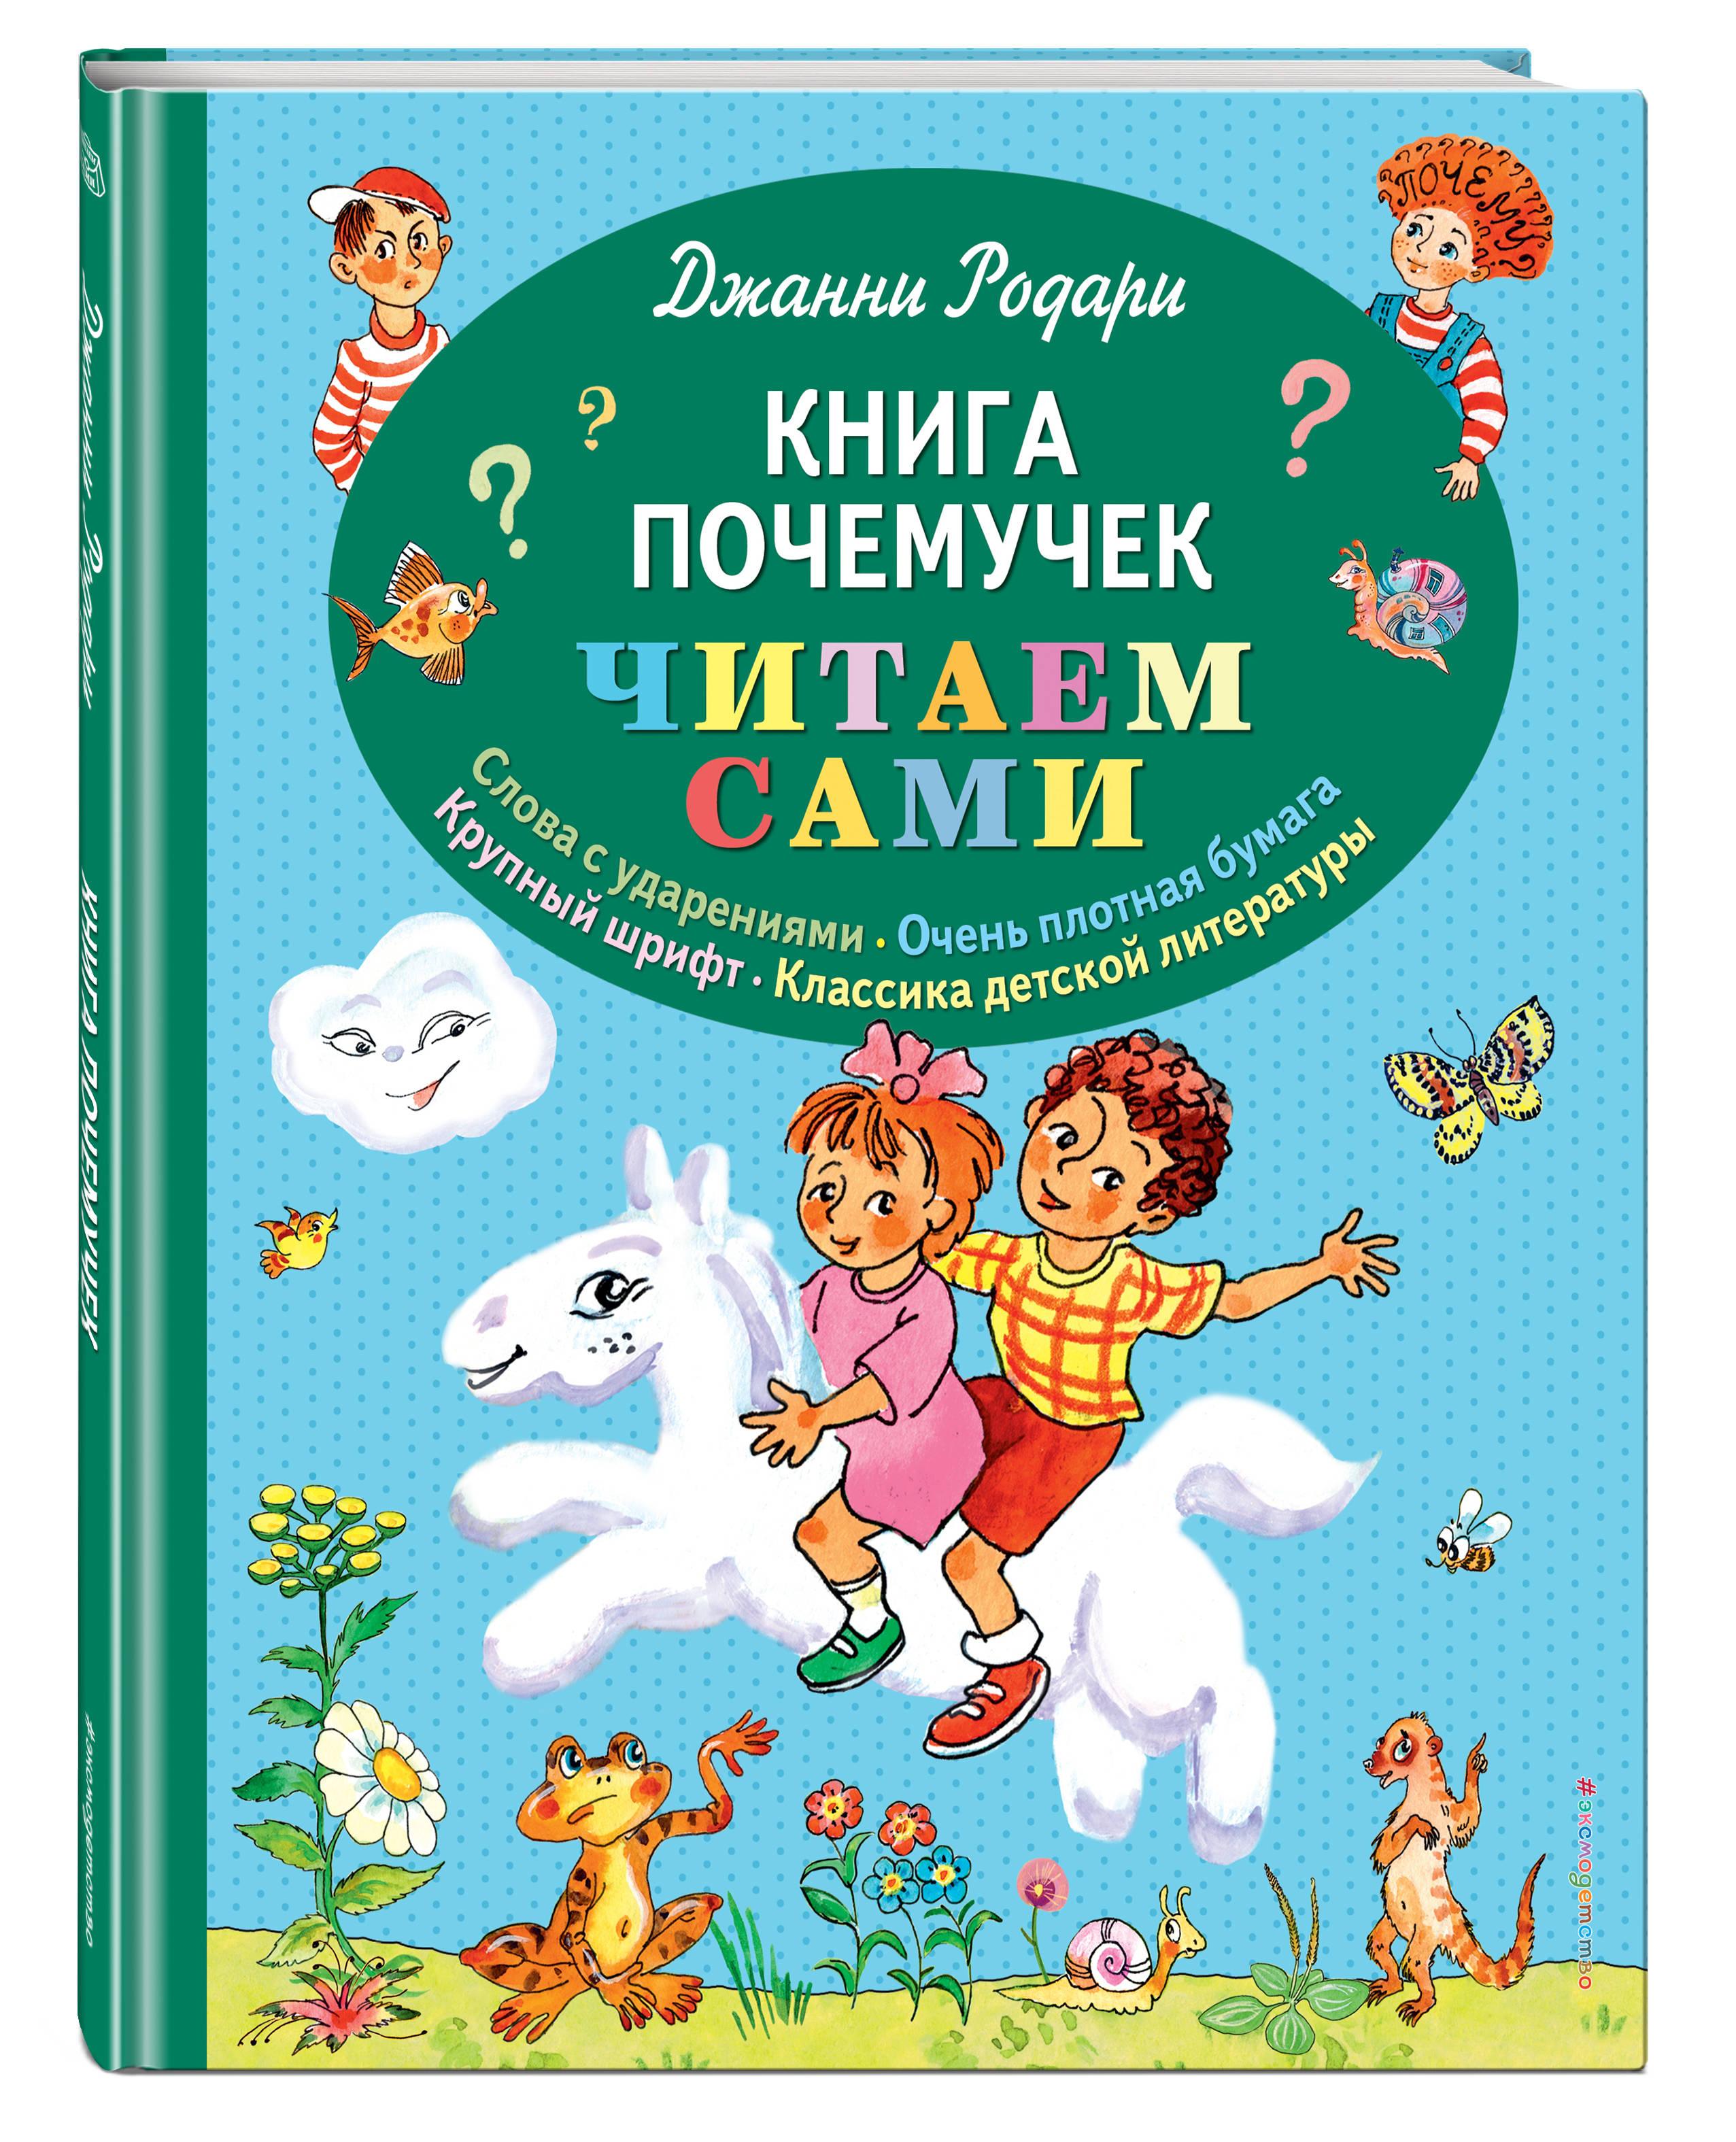 Джанни Родари Книга почемучек родари джанни книга почемучек